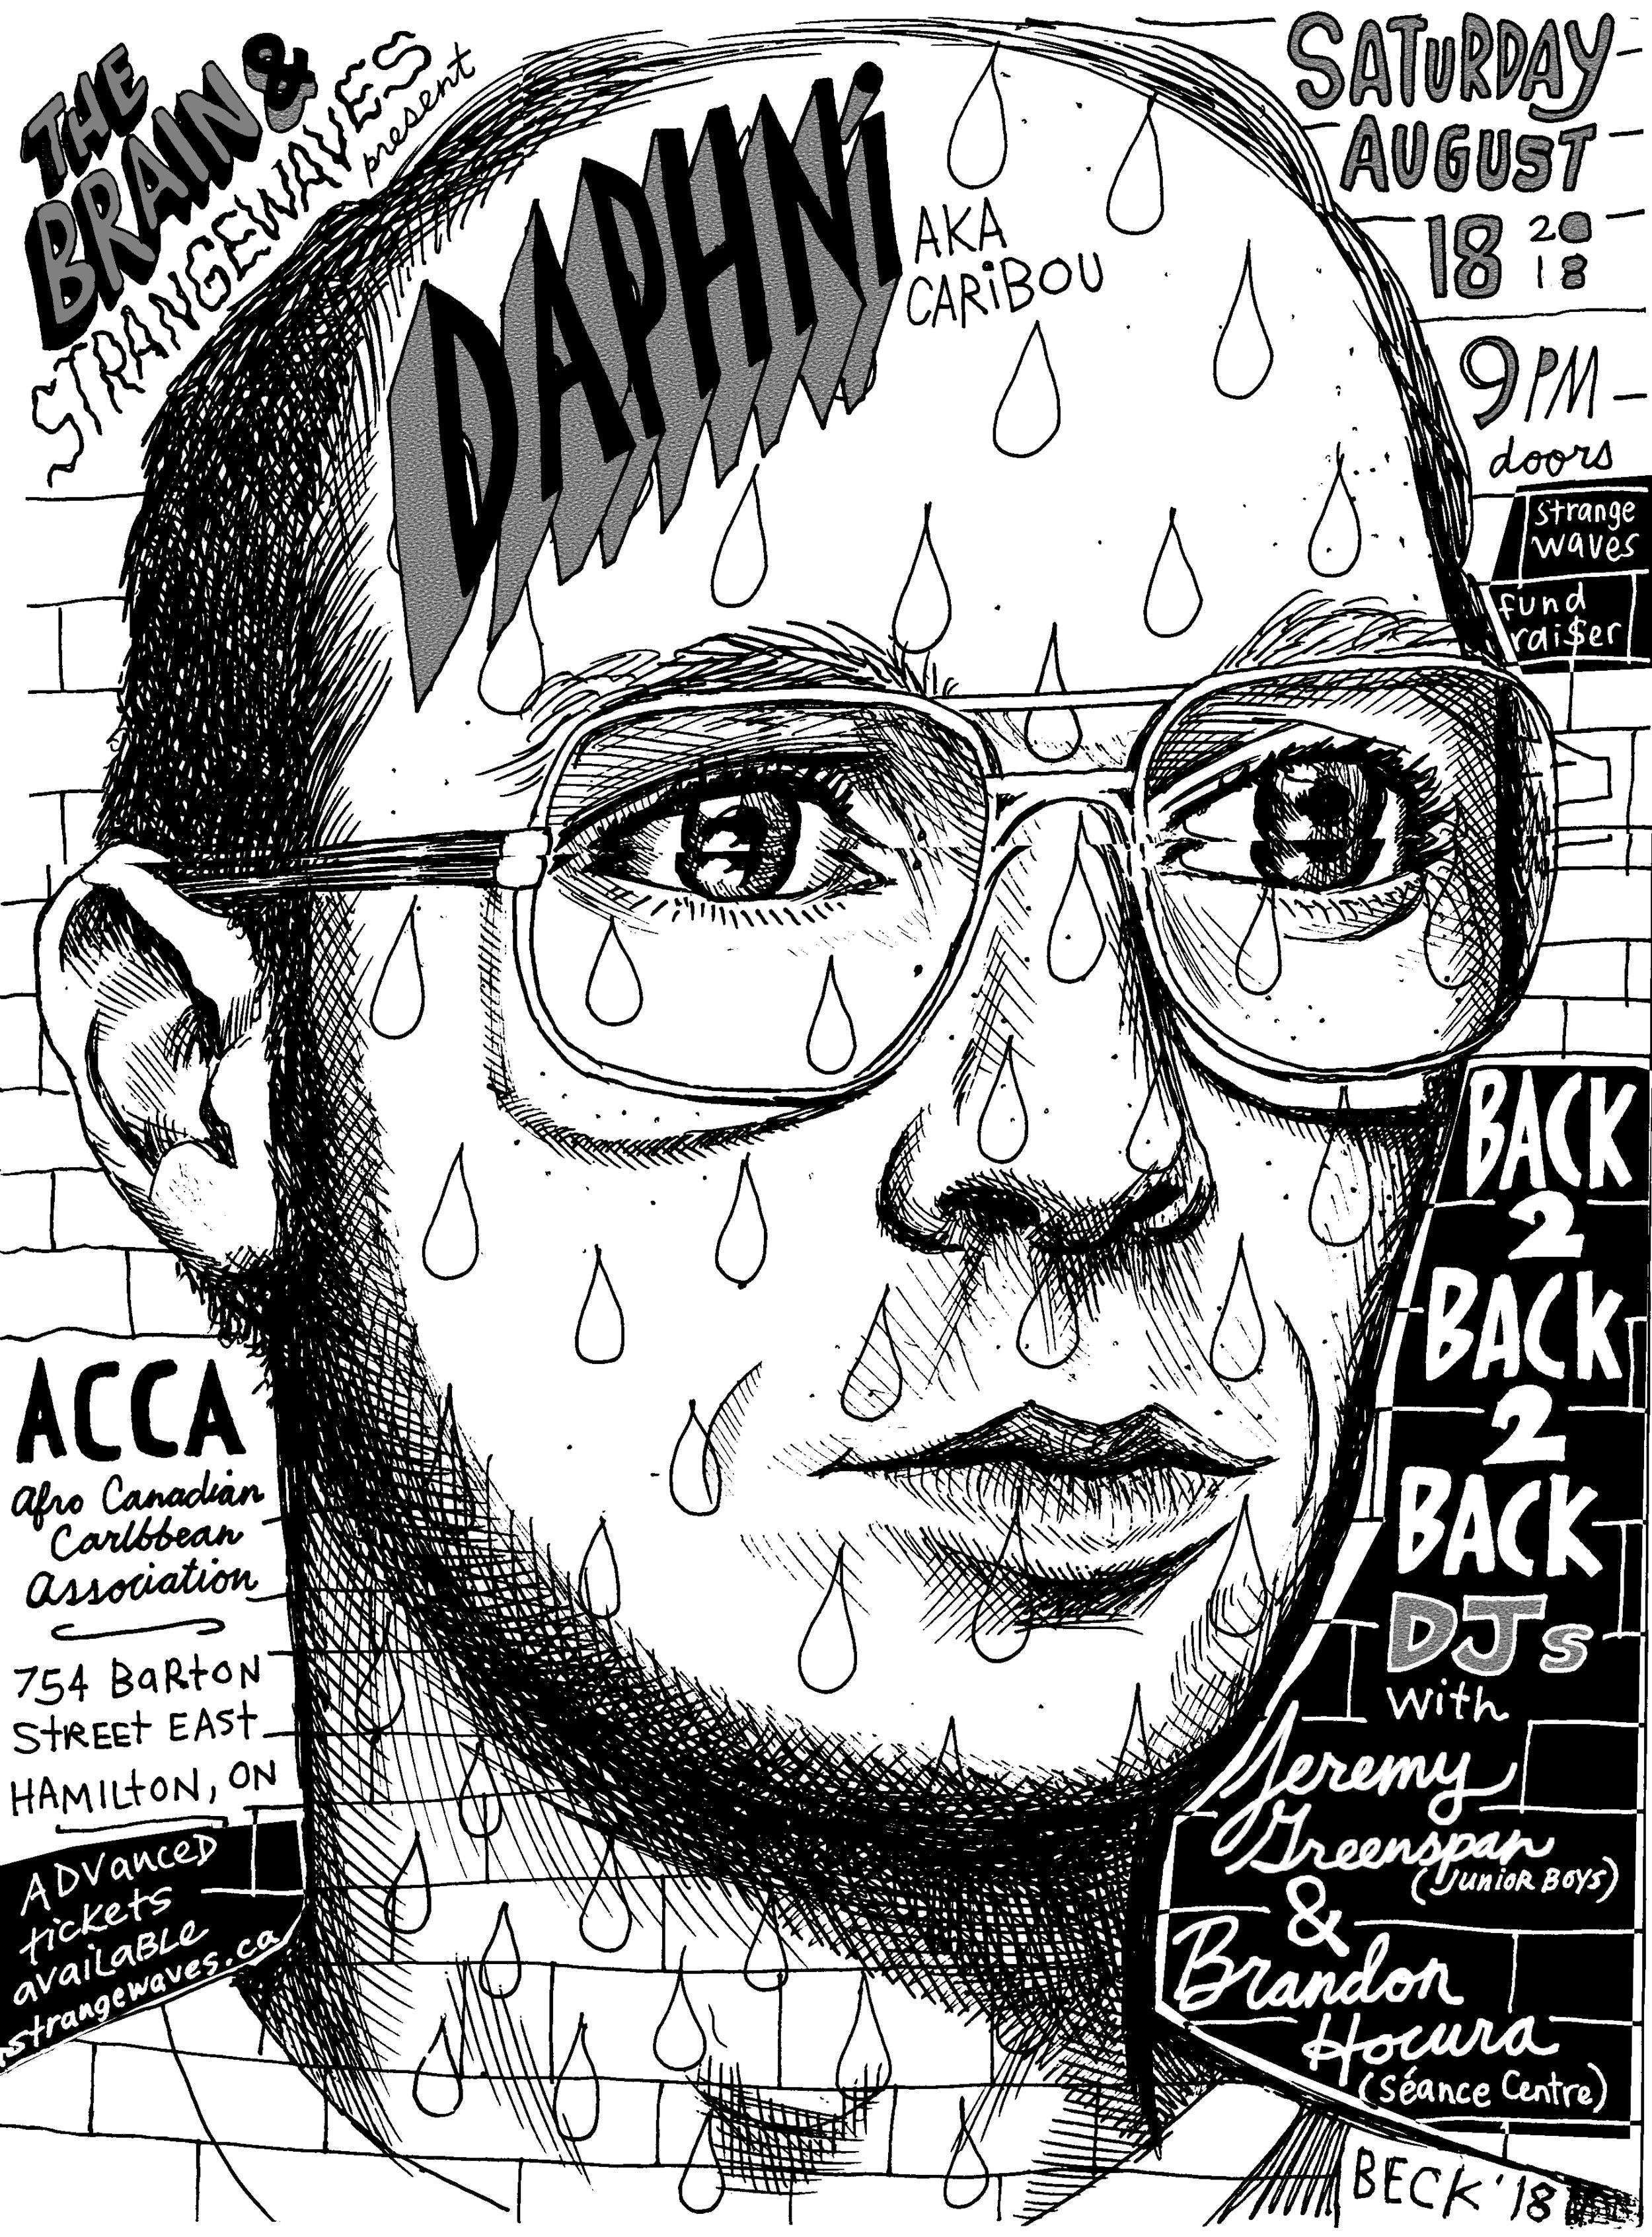 Daphni (Caribou), Jeremy Greenspan, Brandon Hocura  @A.C.C.A